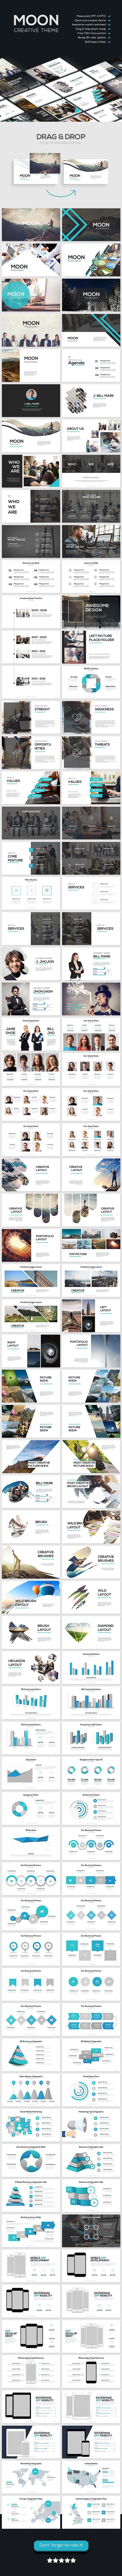 moon - creative theme   presentation templates, creative, Modern powerpoint